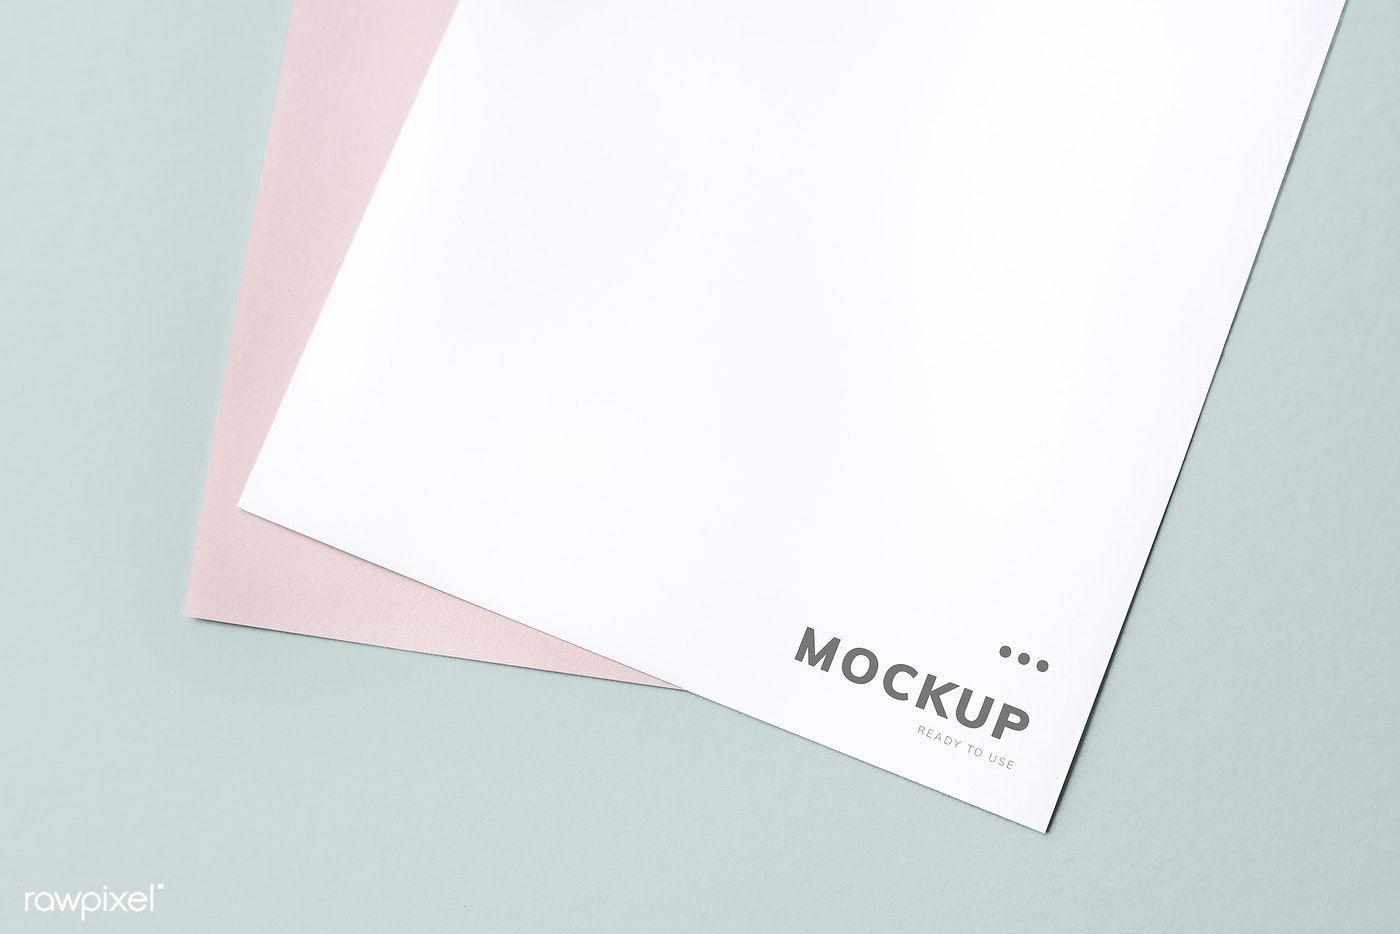 Document Mockup On A Plain Background Free Image By Rawpixel Com Mockup Plains Background Paper Mockup